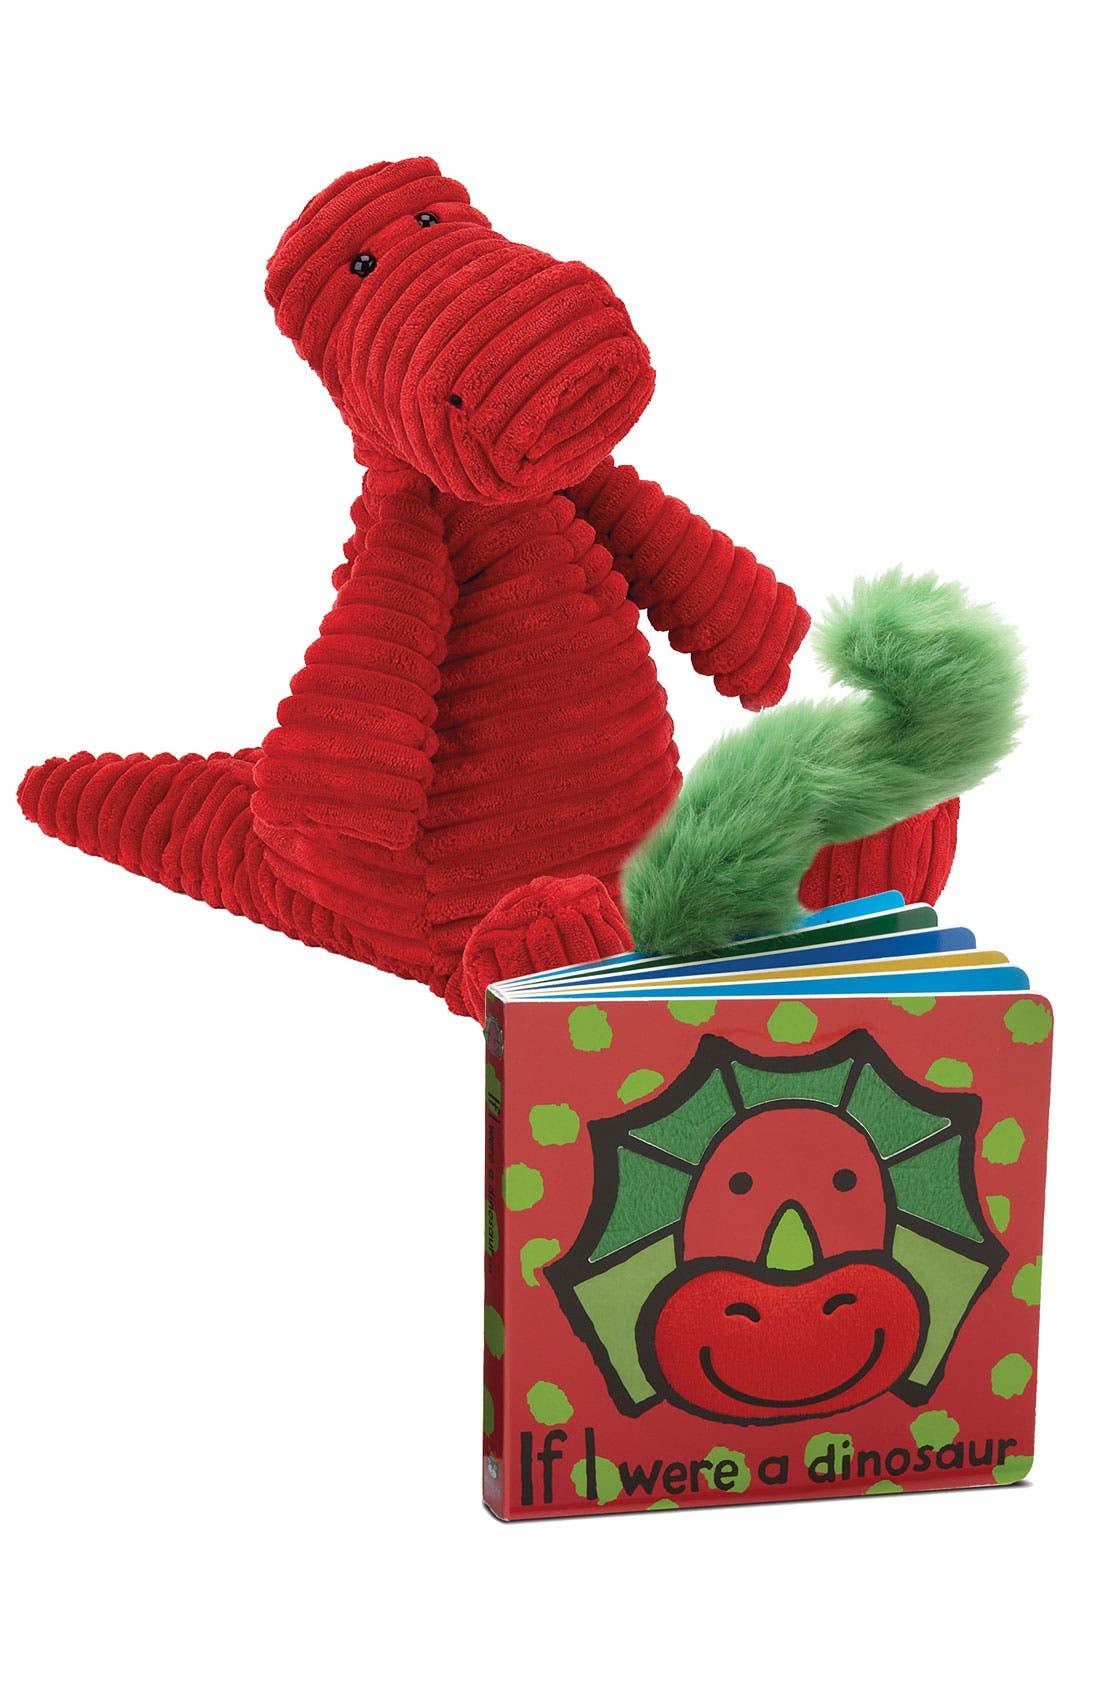 Alternate Image 1 Selected - Jellycat Dinosaur Book & Stuffed Animal